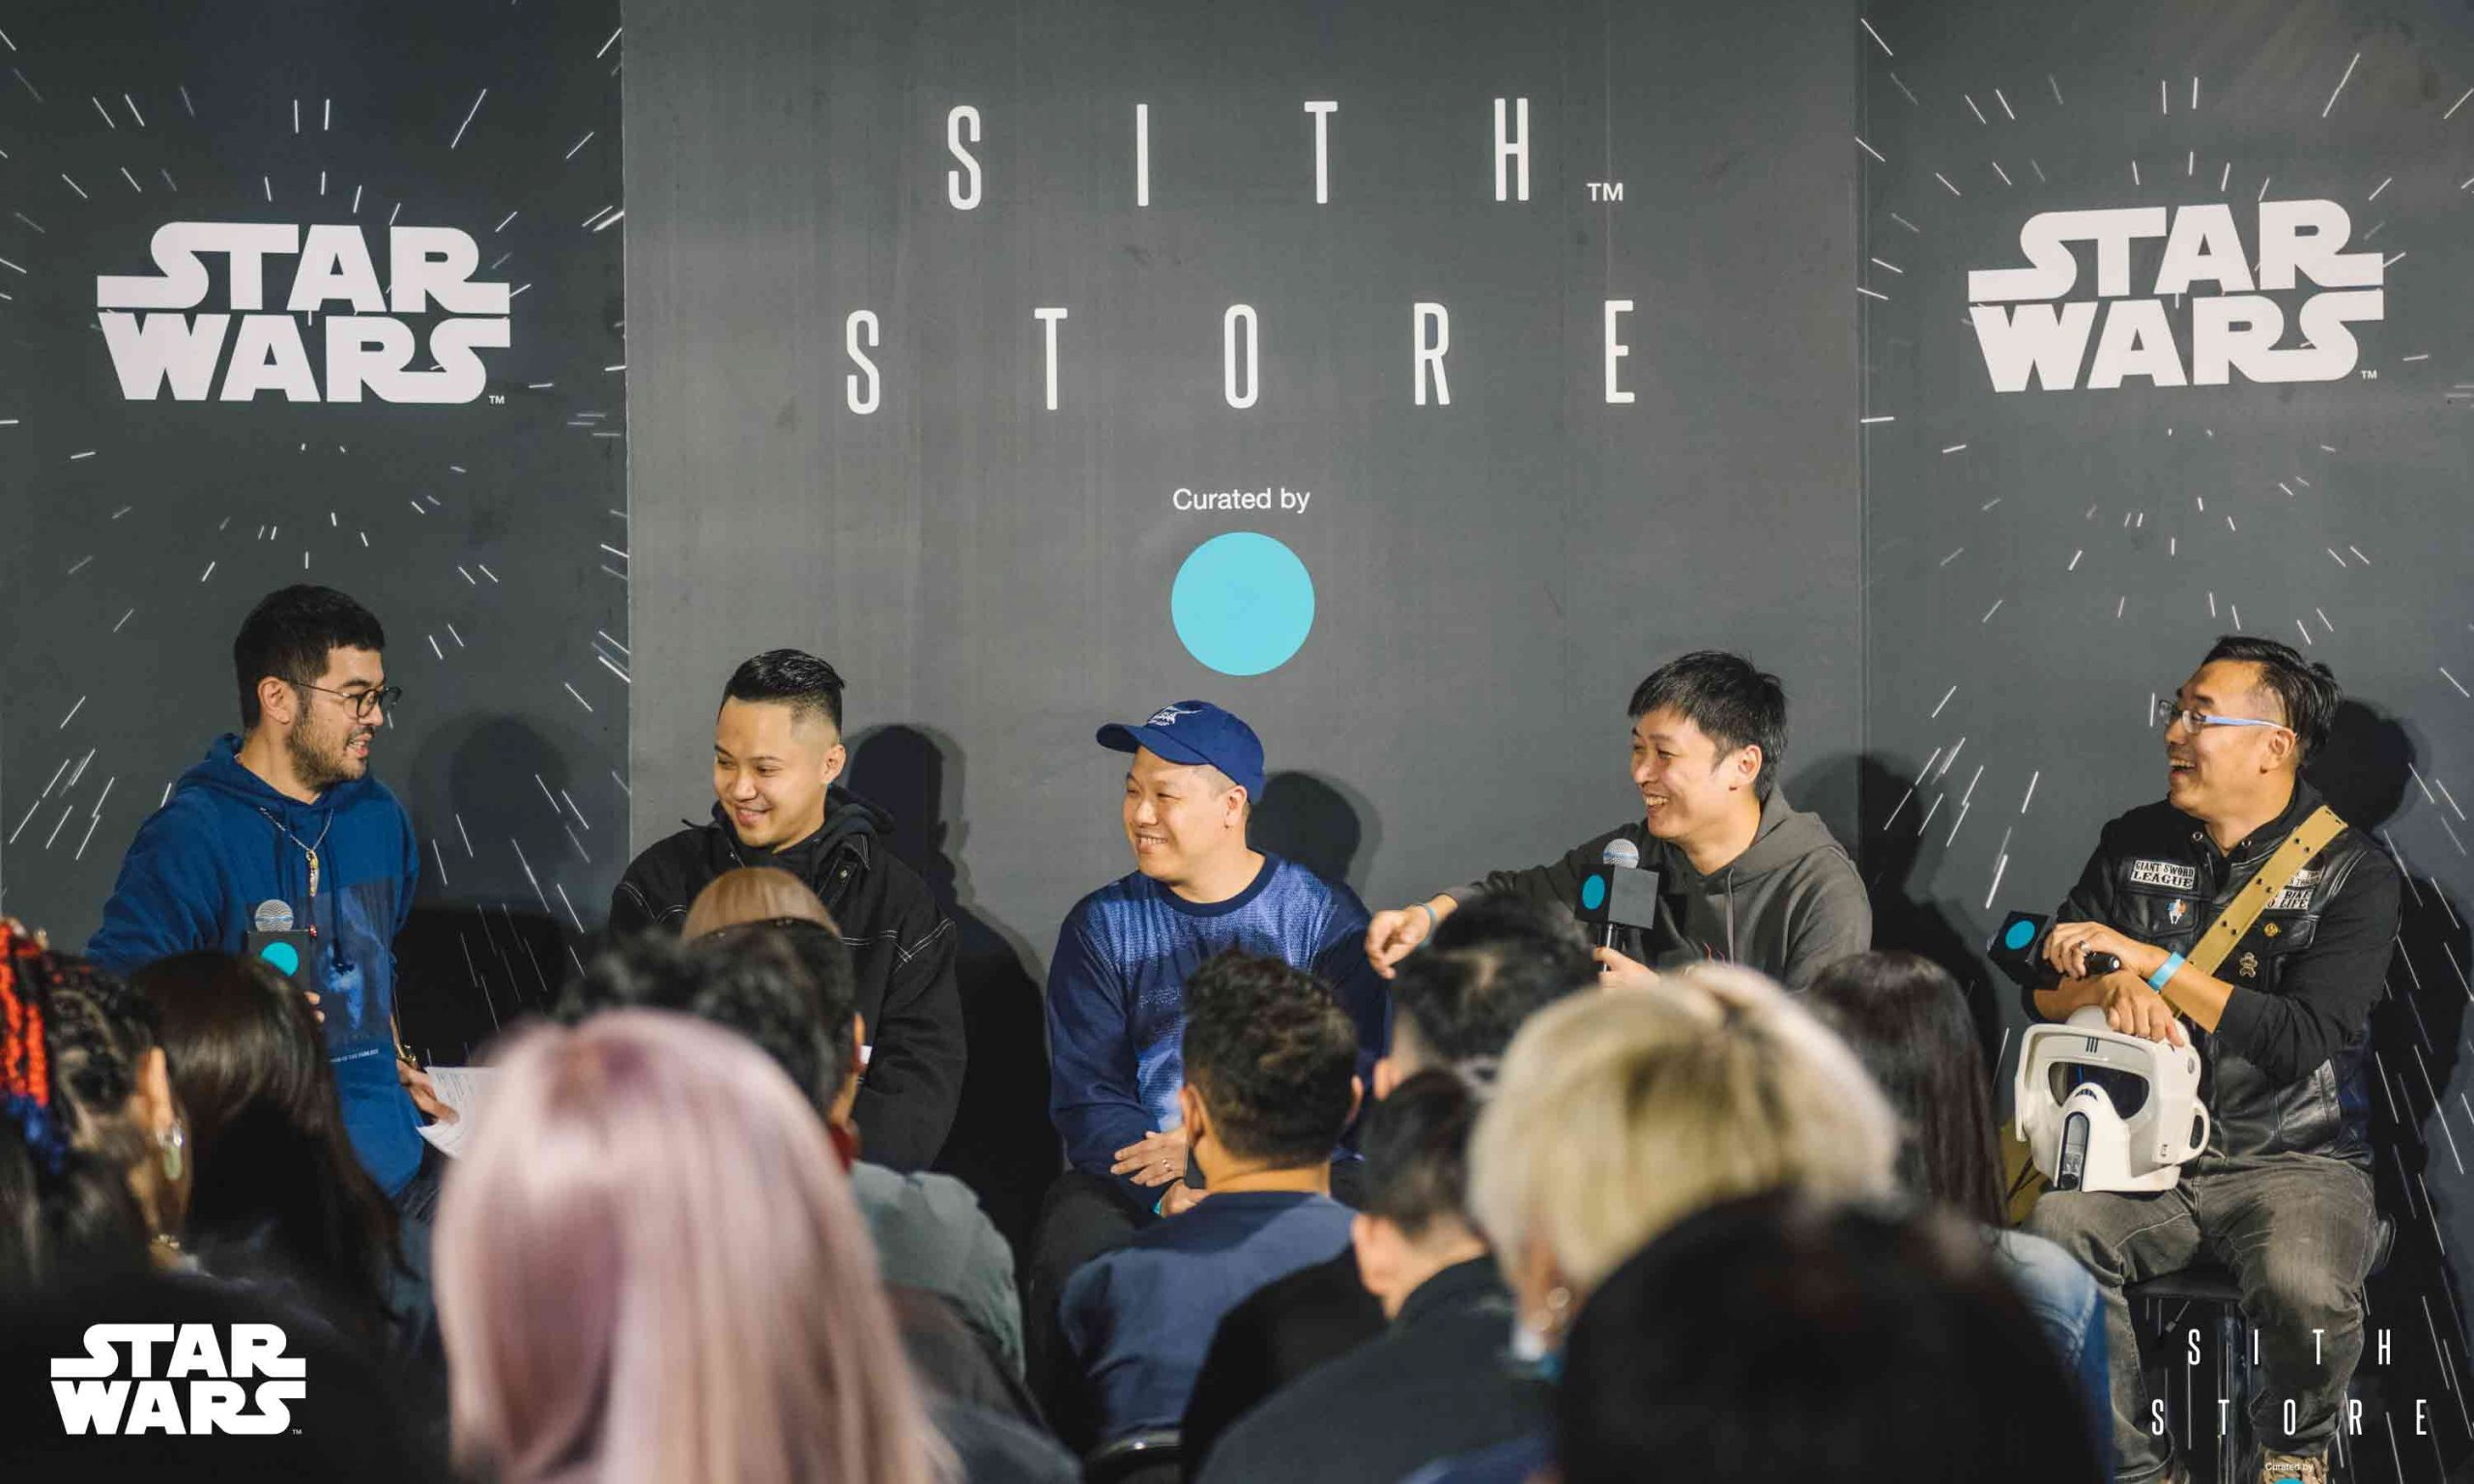 3125C x STAR WARS 合作系列于「SITH STORE」正式发售